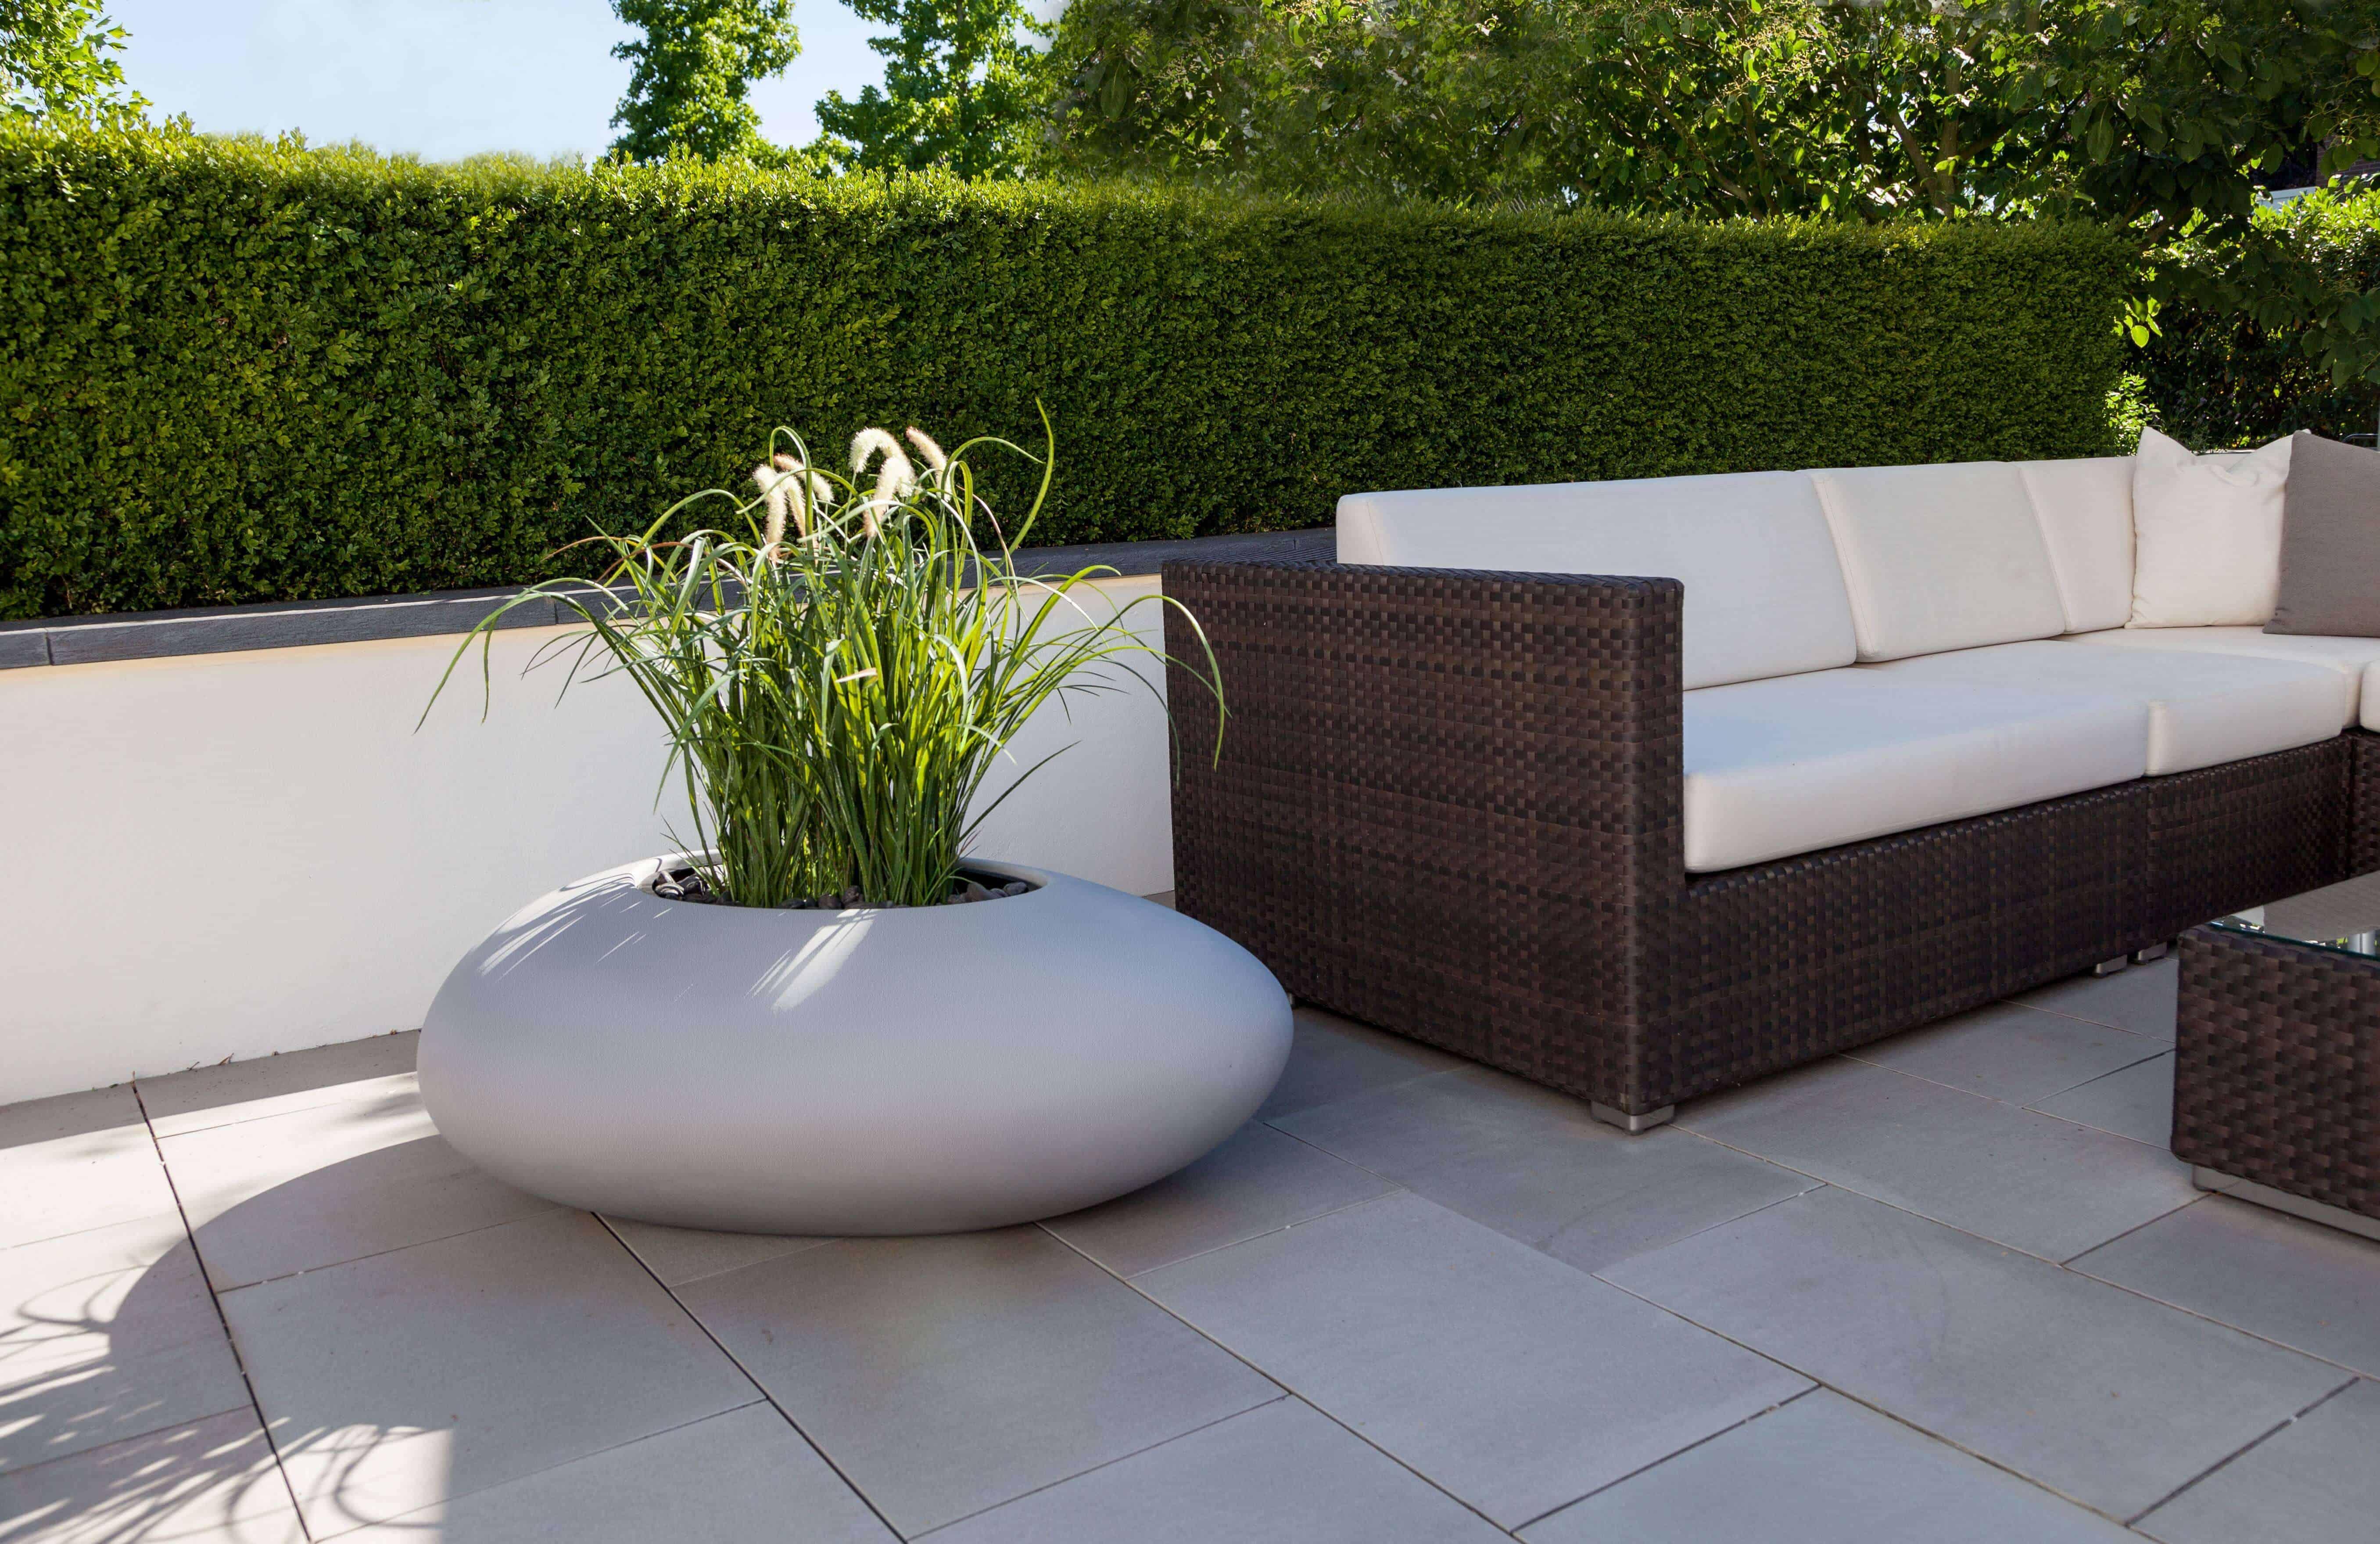 Bloembak in betonkleur in harmonie met de terrastegel